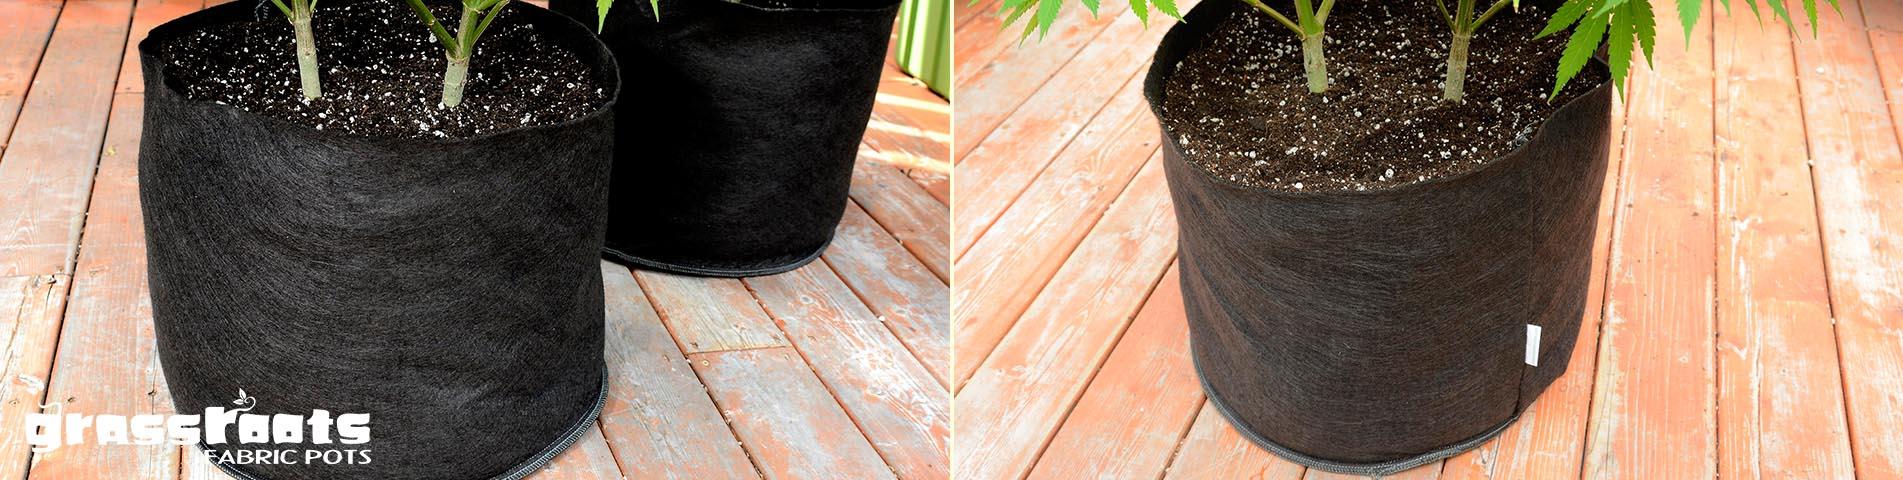 5 gallon grassroots fabric pots